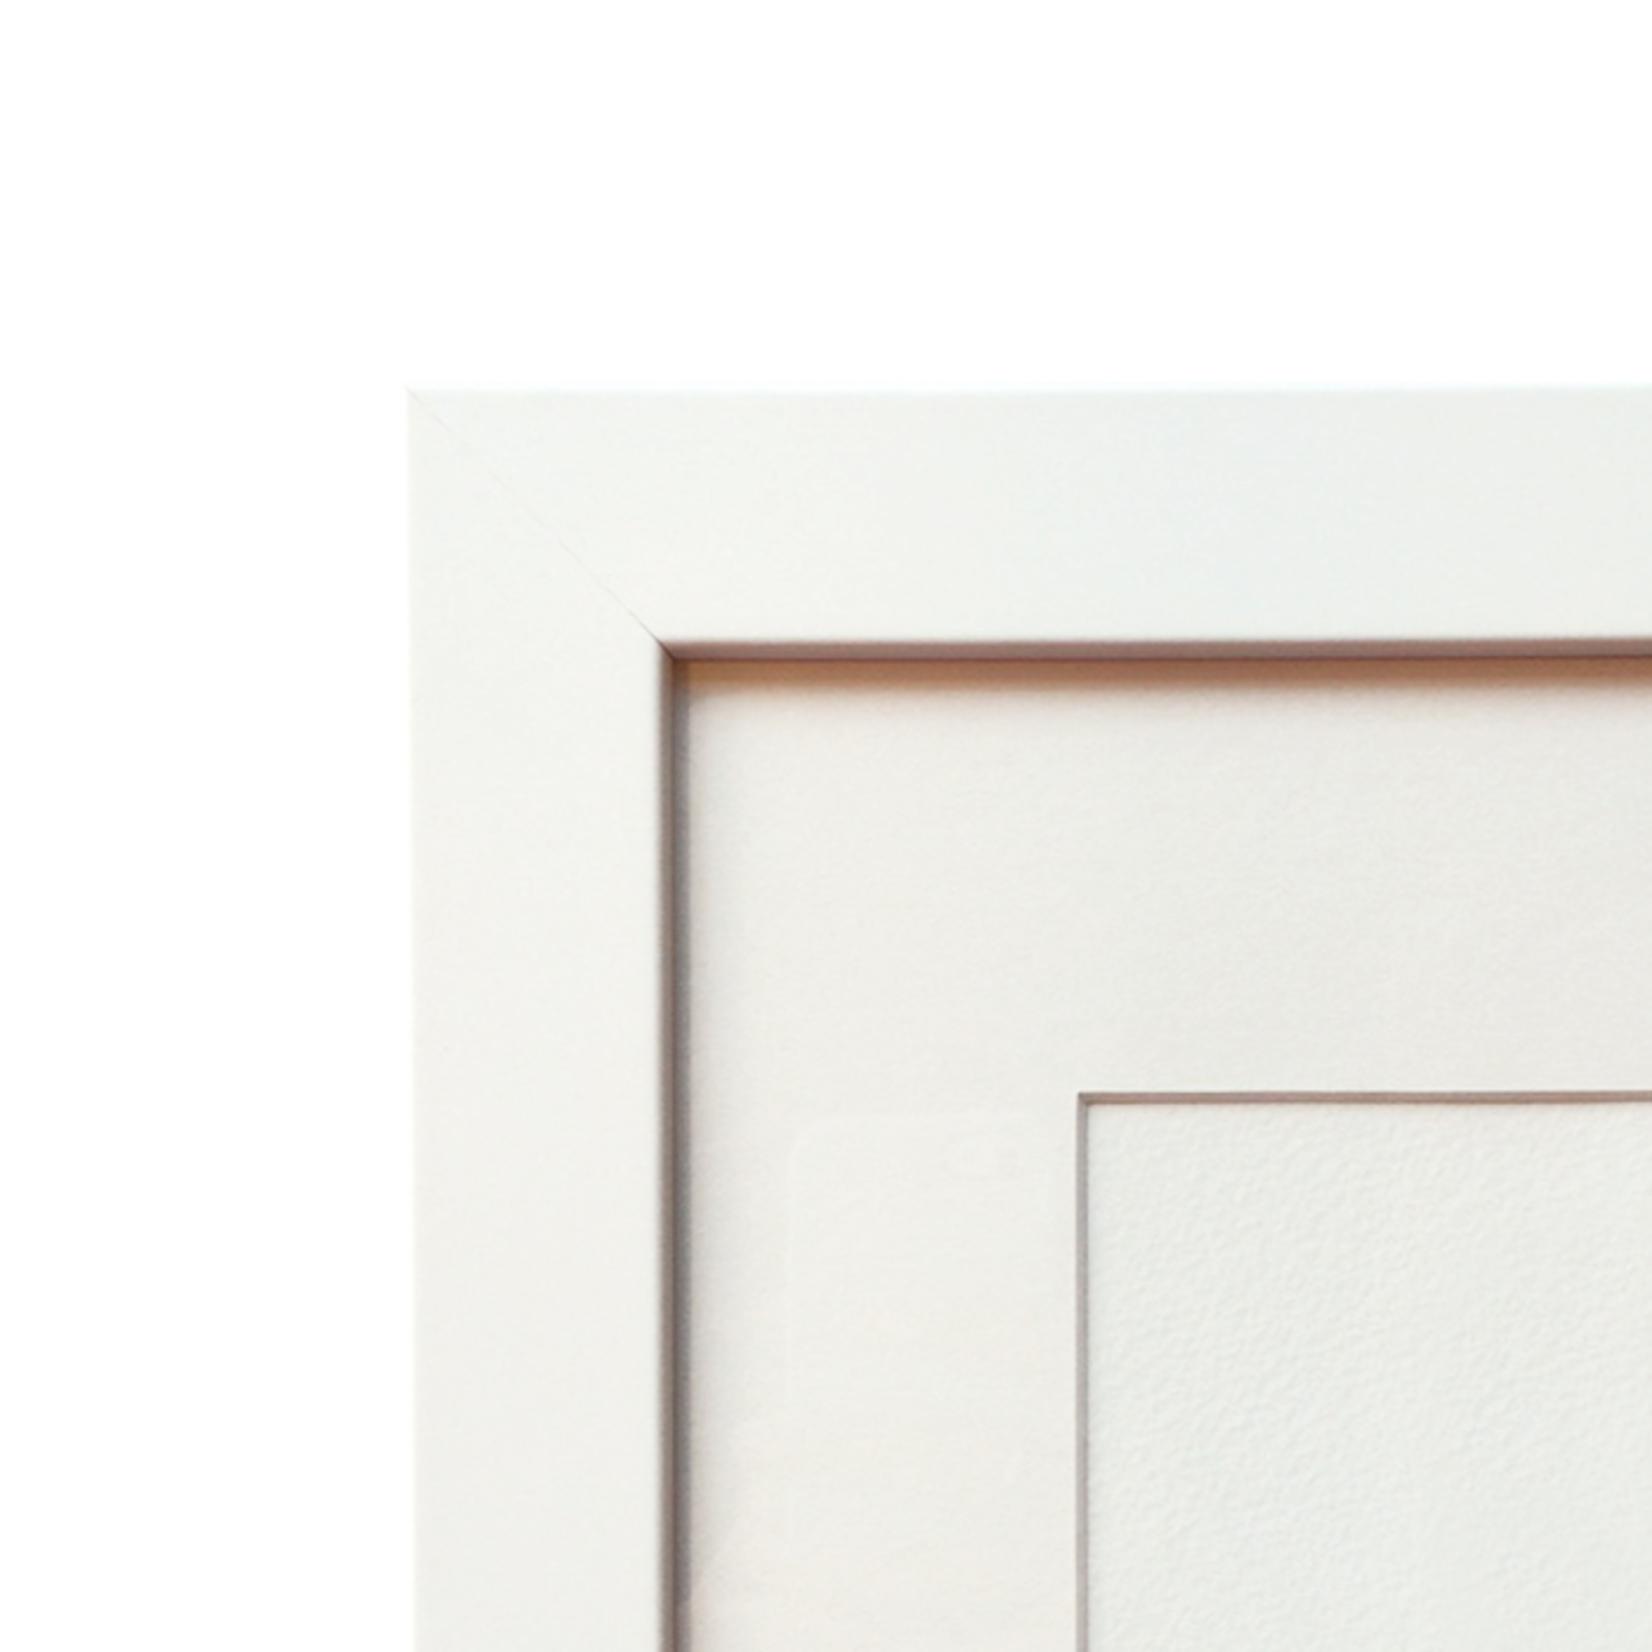 Limited Edition Prints Lilac sailboat, 2013